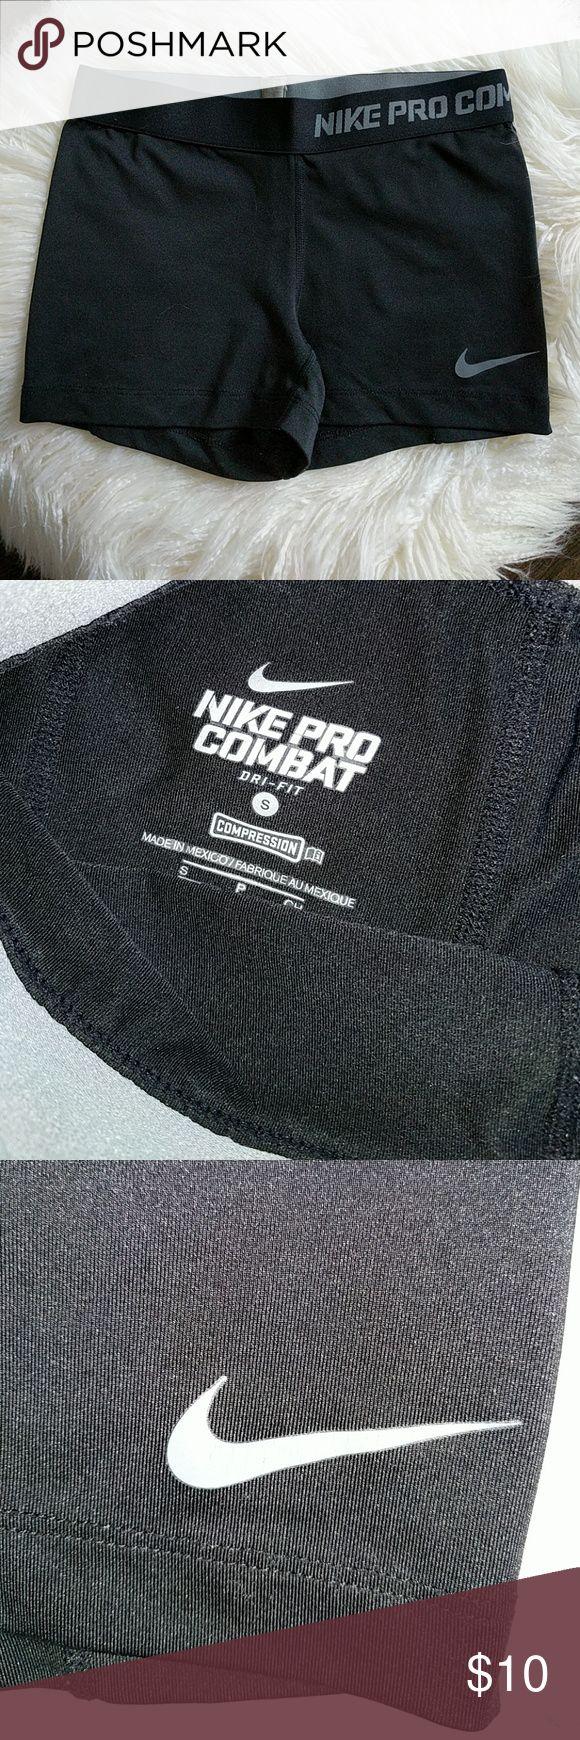 Nike pro combat shorts Size small. Great condition. Black Nike Shorts